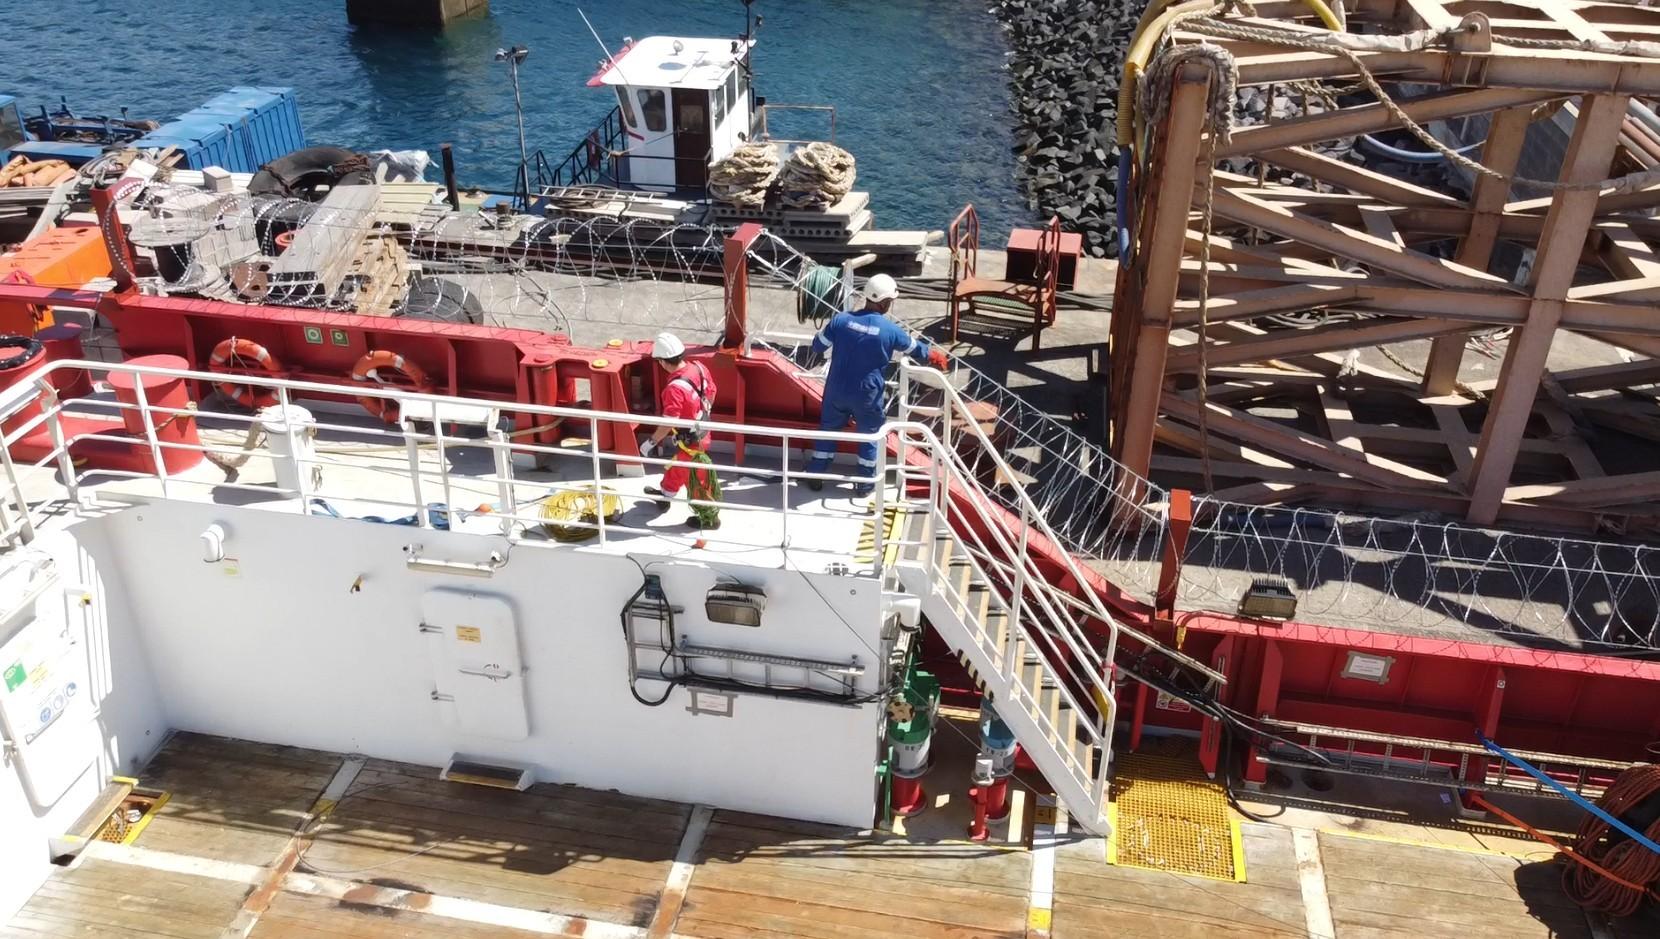 Razor wire installation tanker vessel